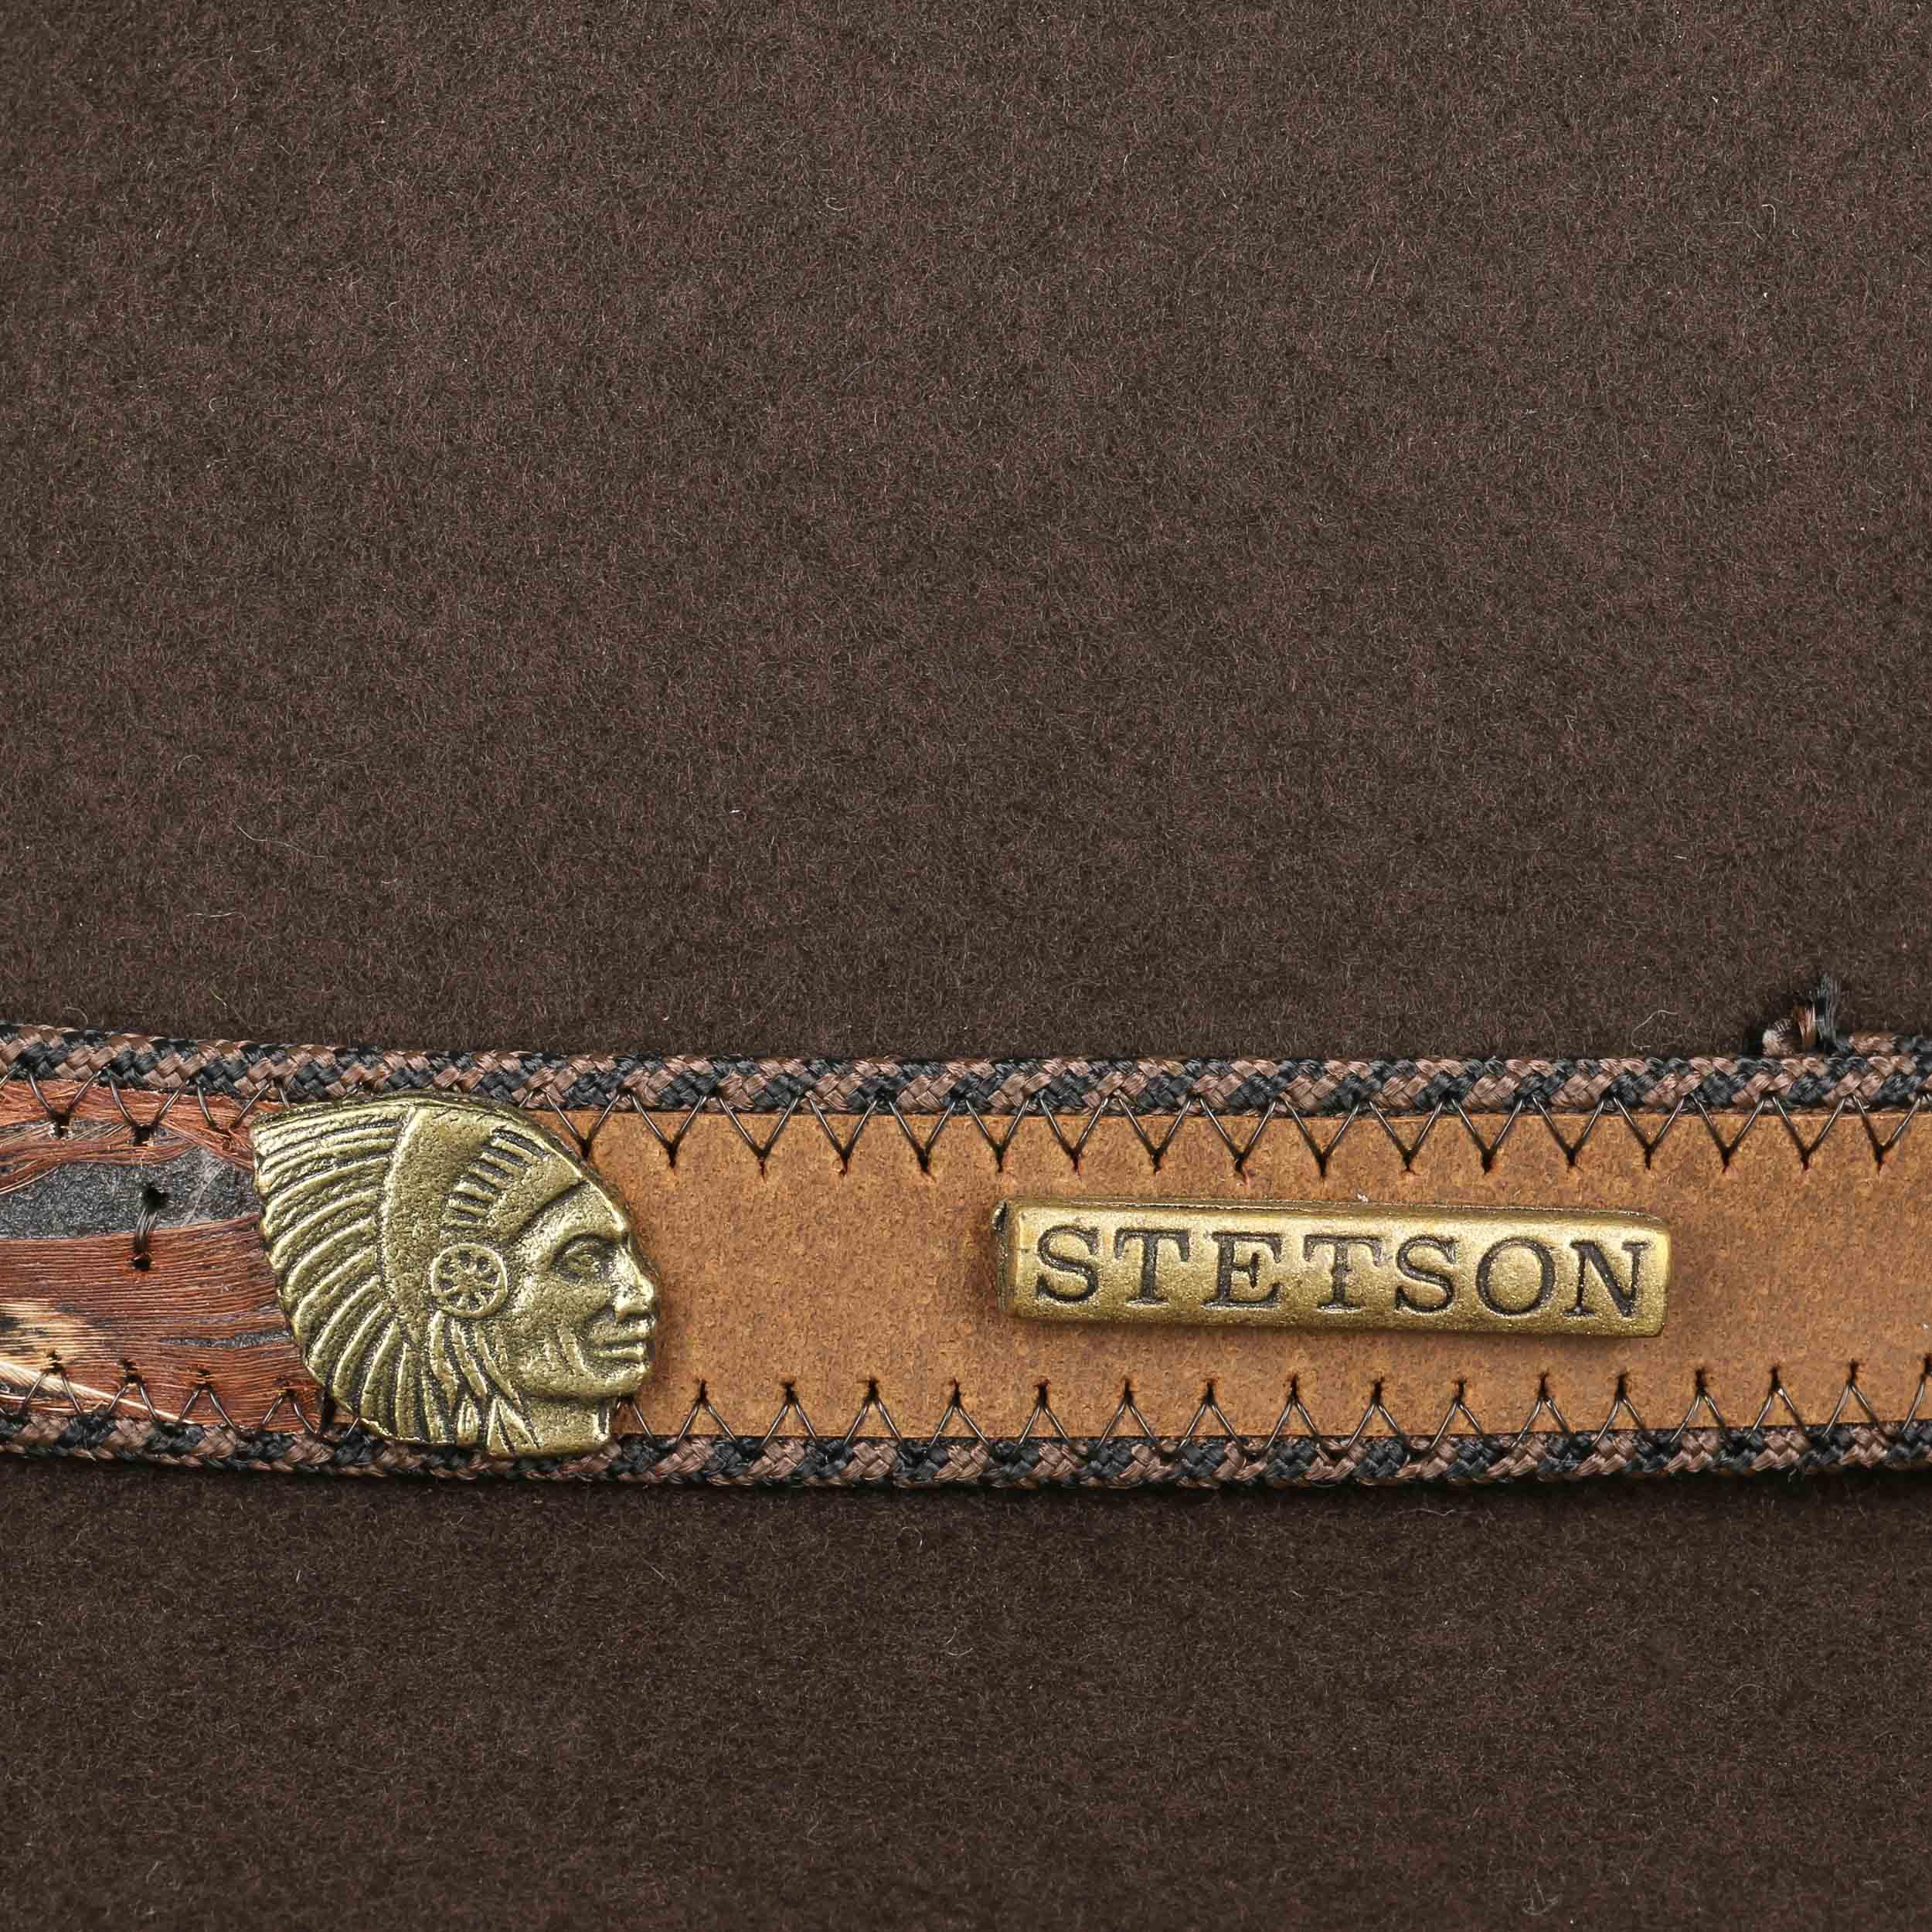 ... Feather Trim VitaFelt Hat by Stetson - brown 3 ... ffd6376146b